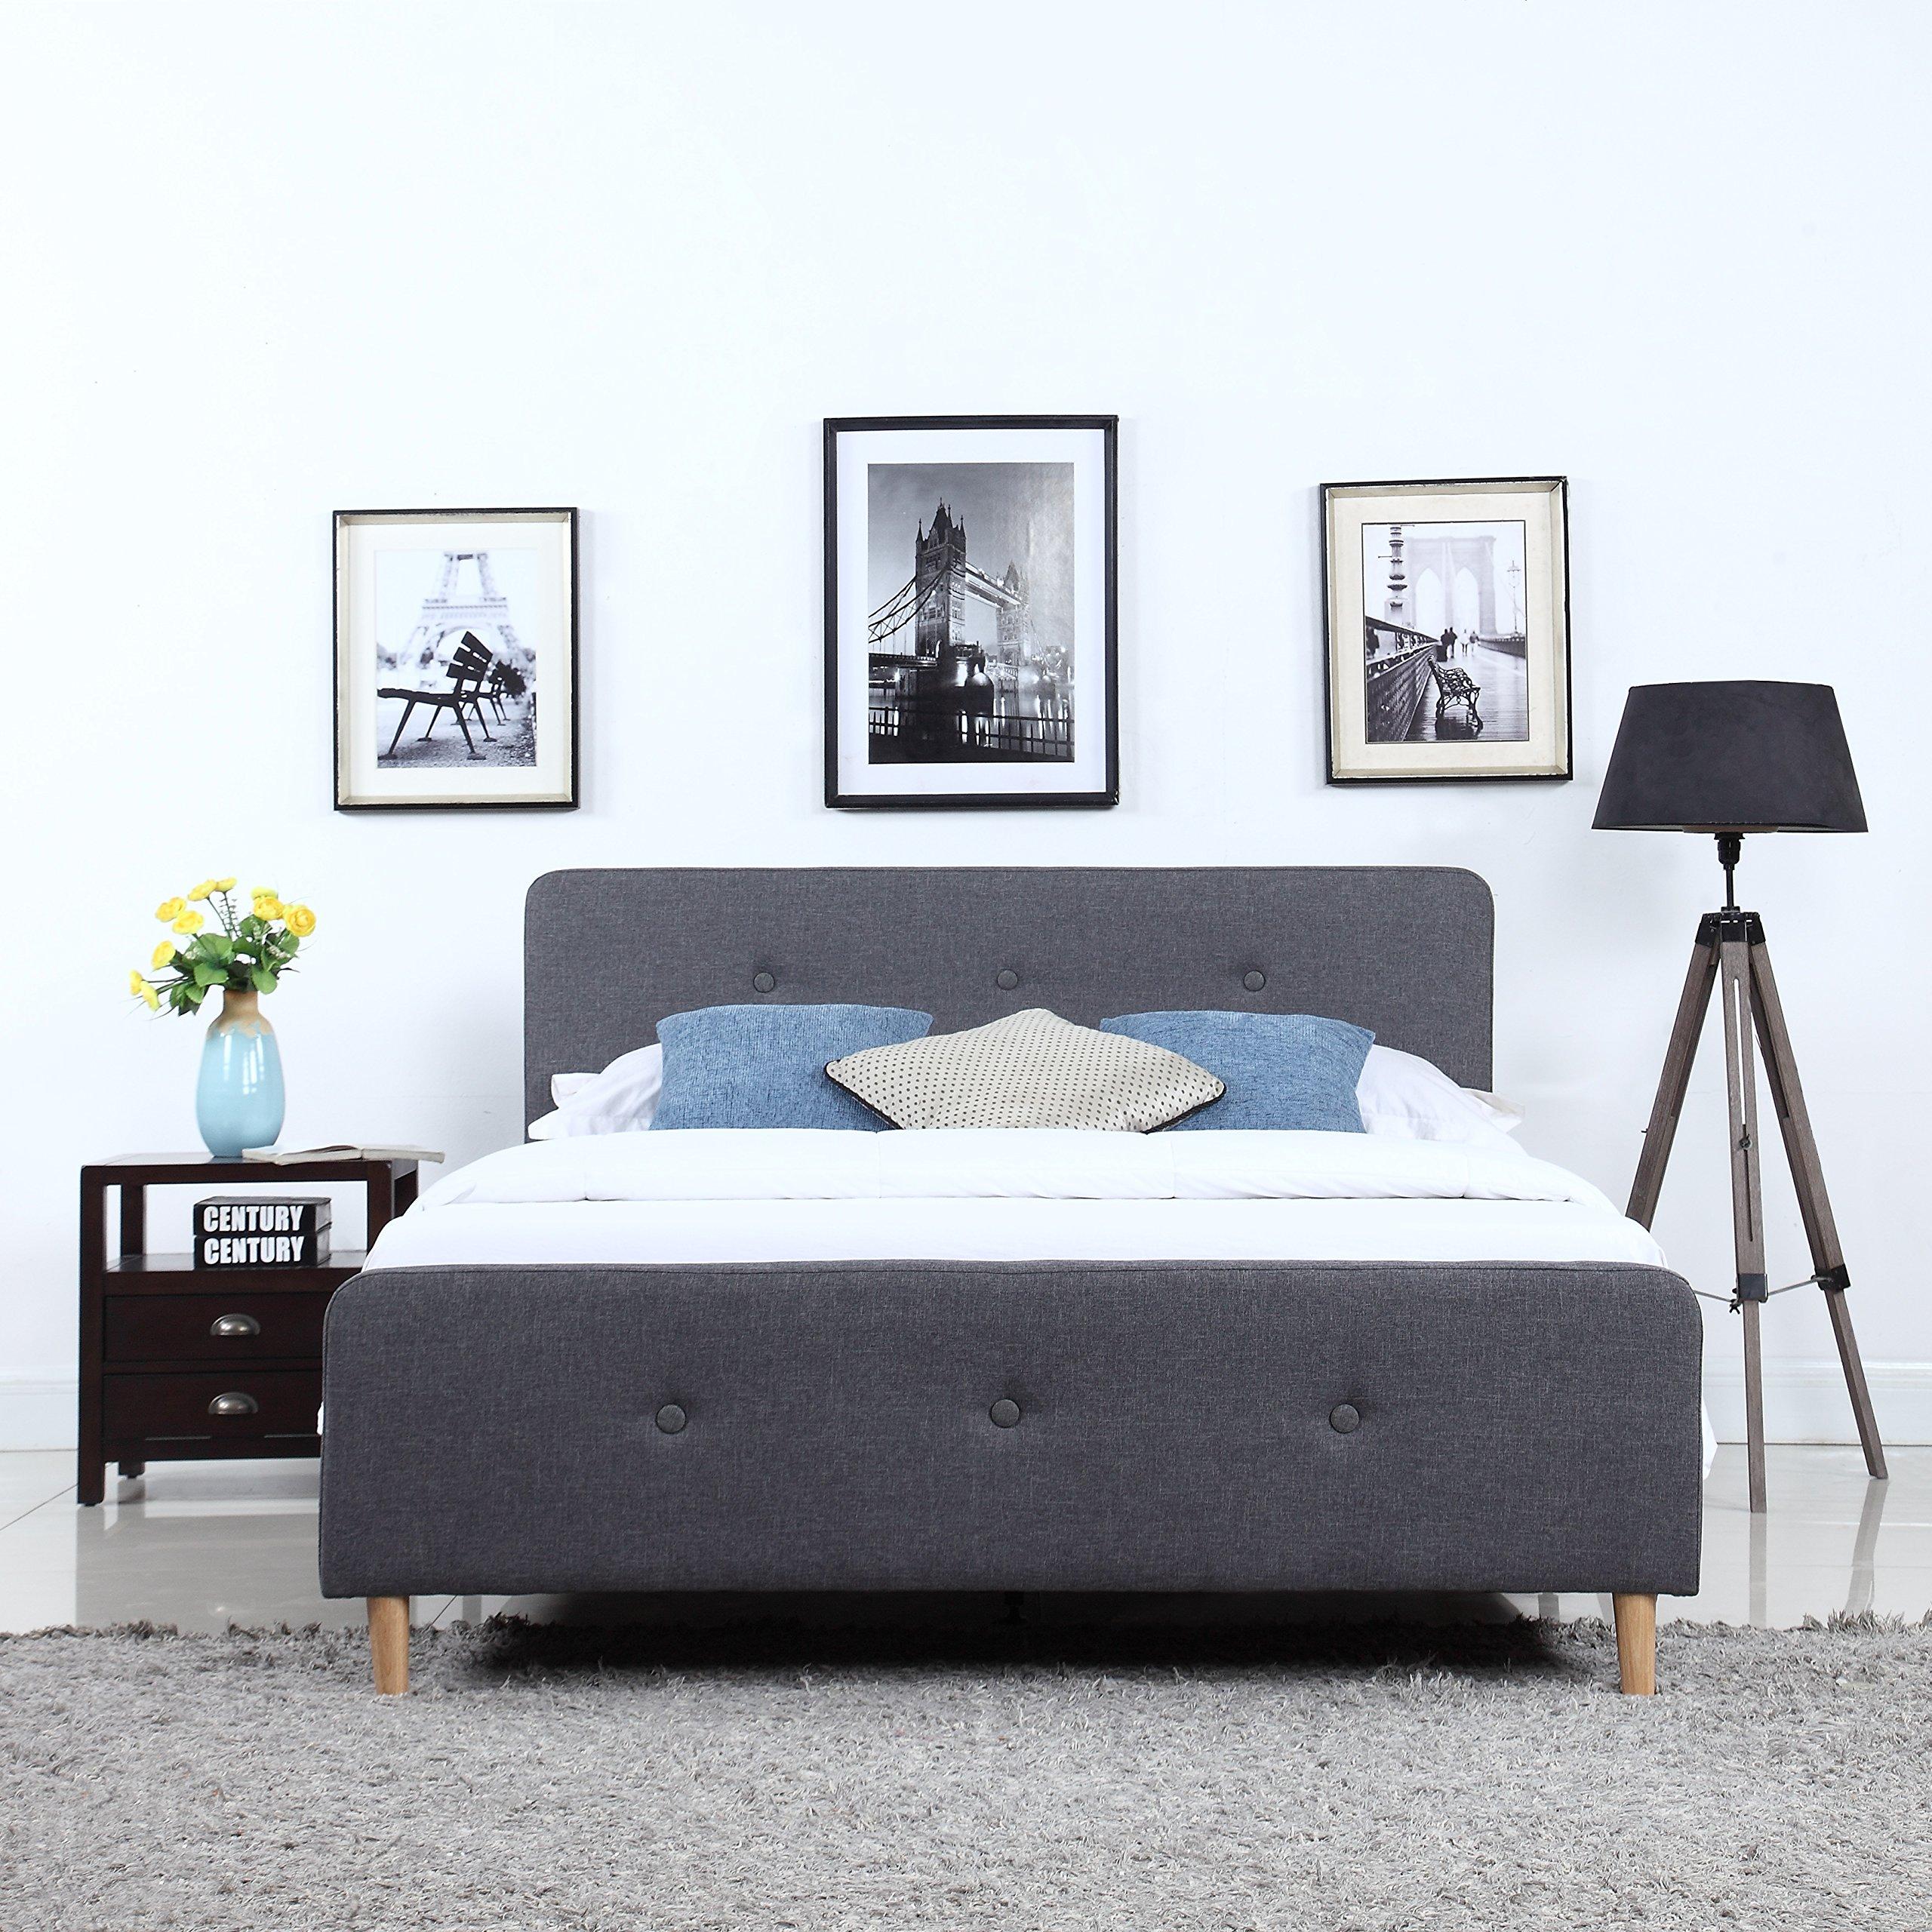 DIVANO ROMA FURNITURE Mid Century Modern Linen Fabric Low Profile Bed Frame (Full, Dark Grey) by DIVANO ROMA FURNITURE